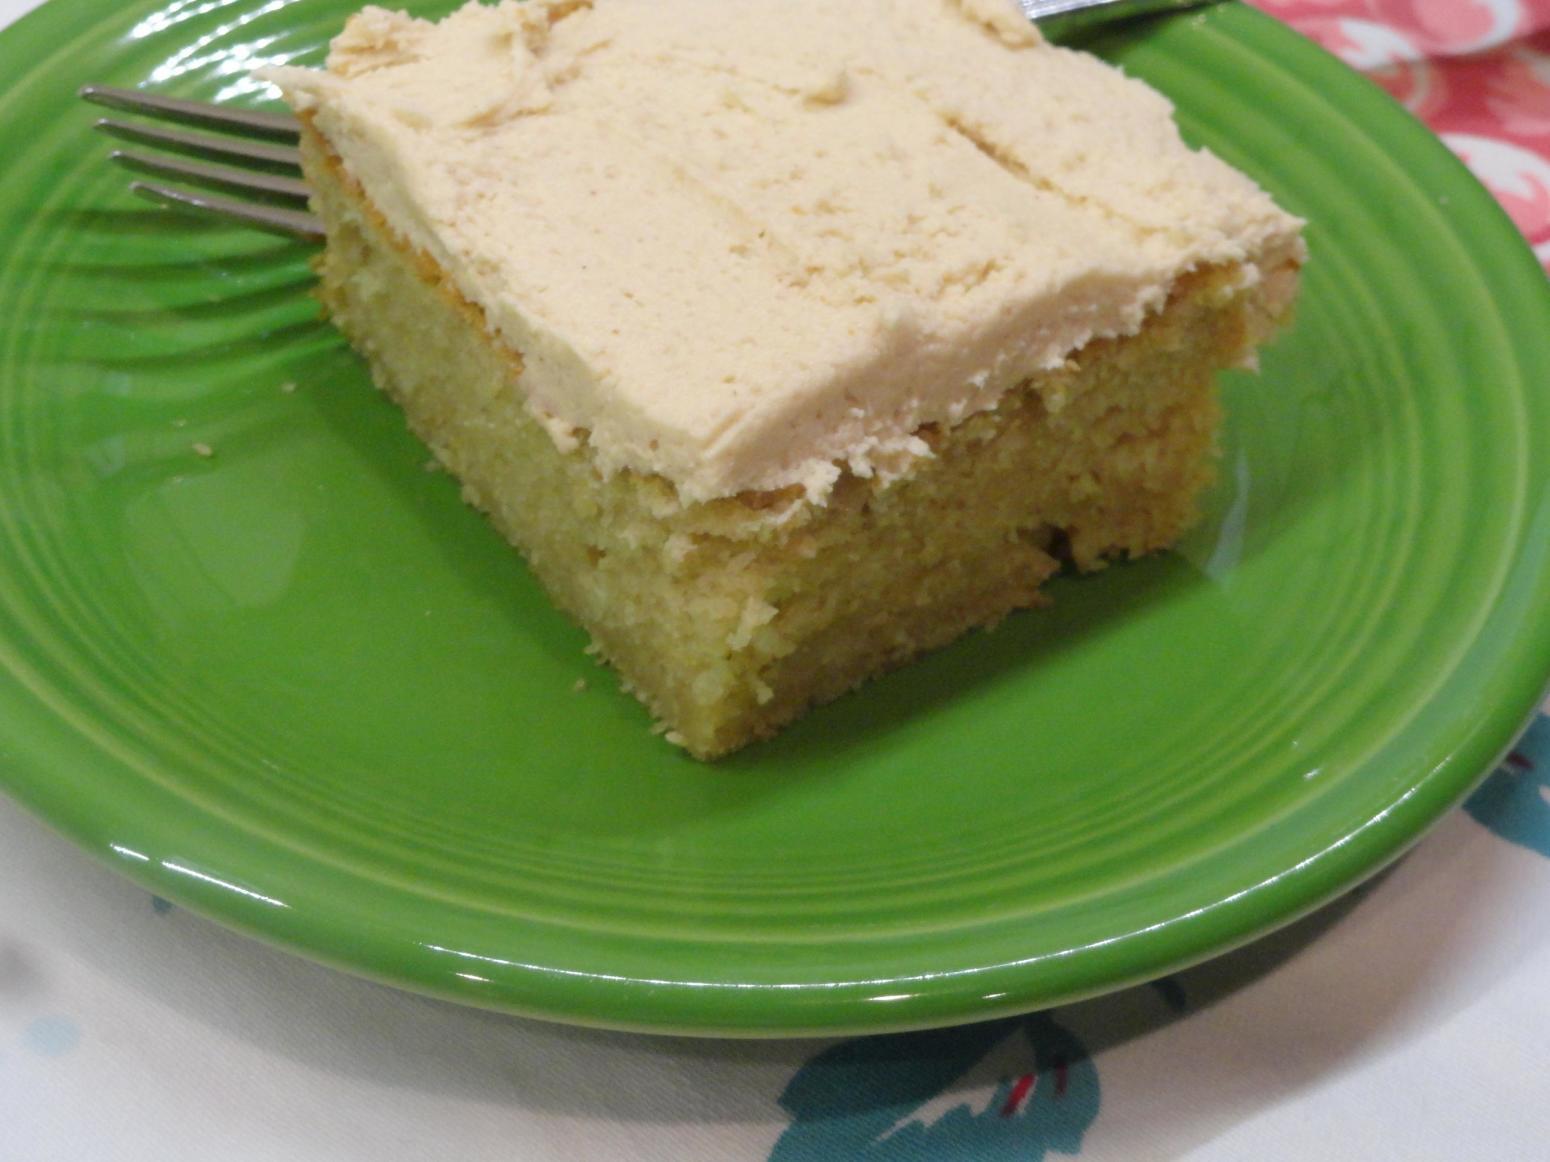 Peanut Butter Cake Recipe  Easy Peanut Butter Cake & Peanut Butter Frosting Recipe